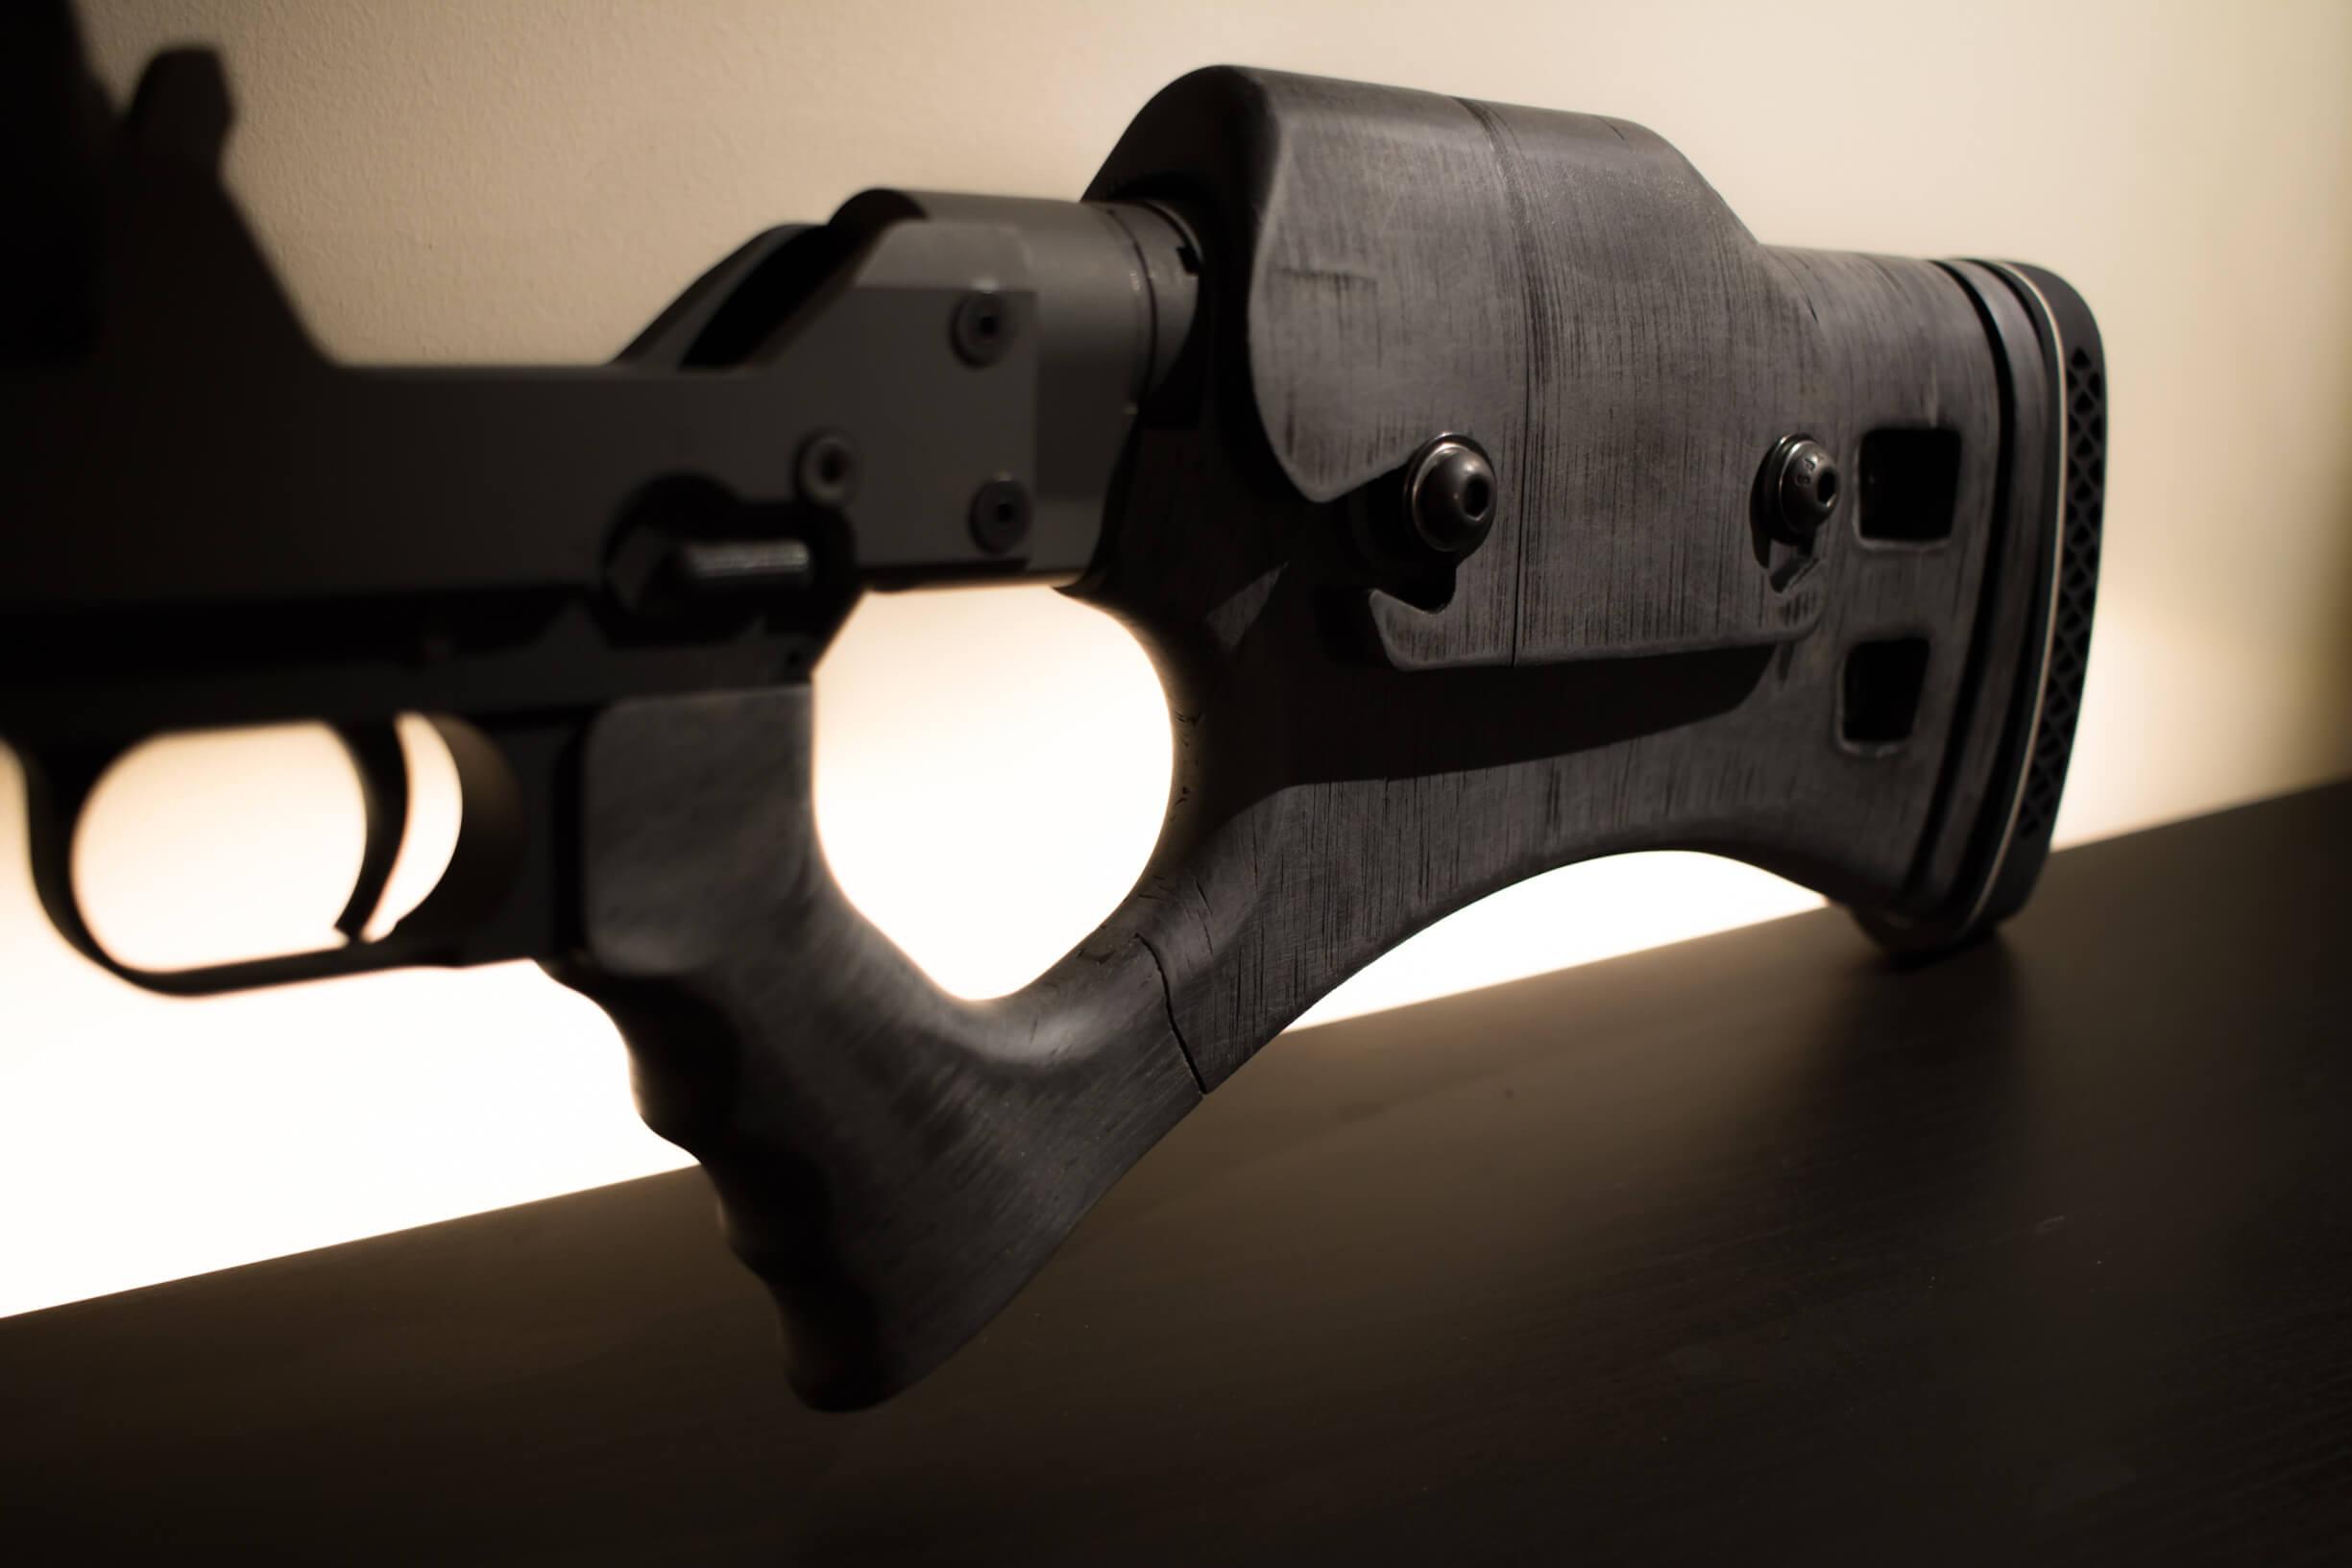 Serbu RN-50 3D Printed Carbon Composite Thumbhole Rifle